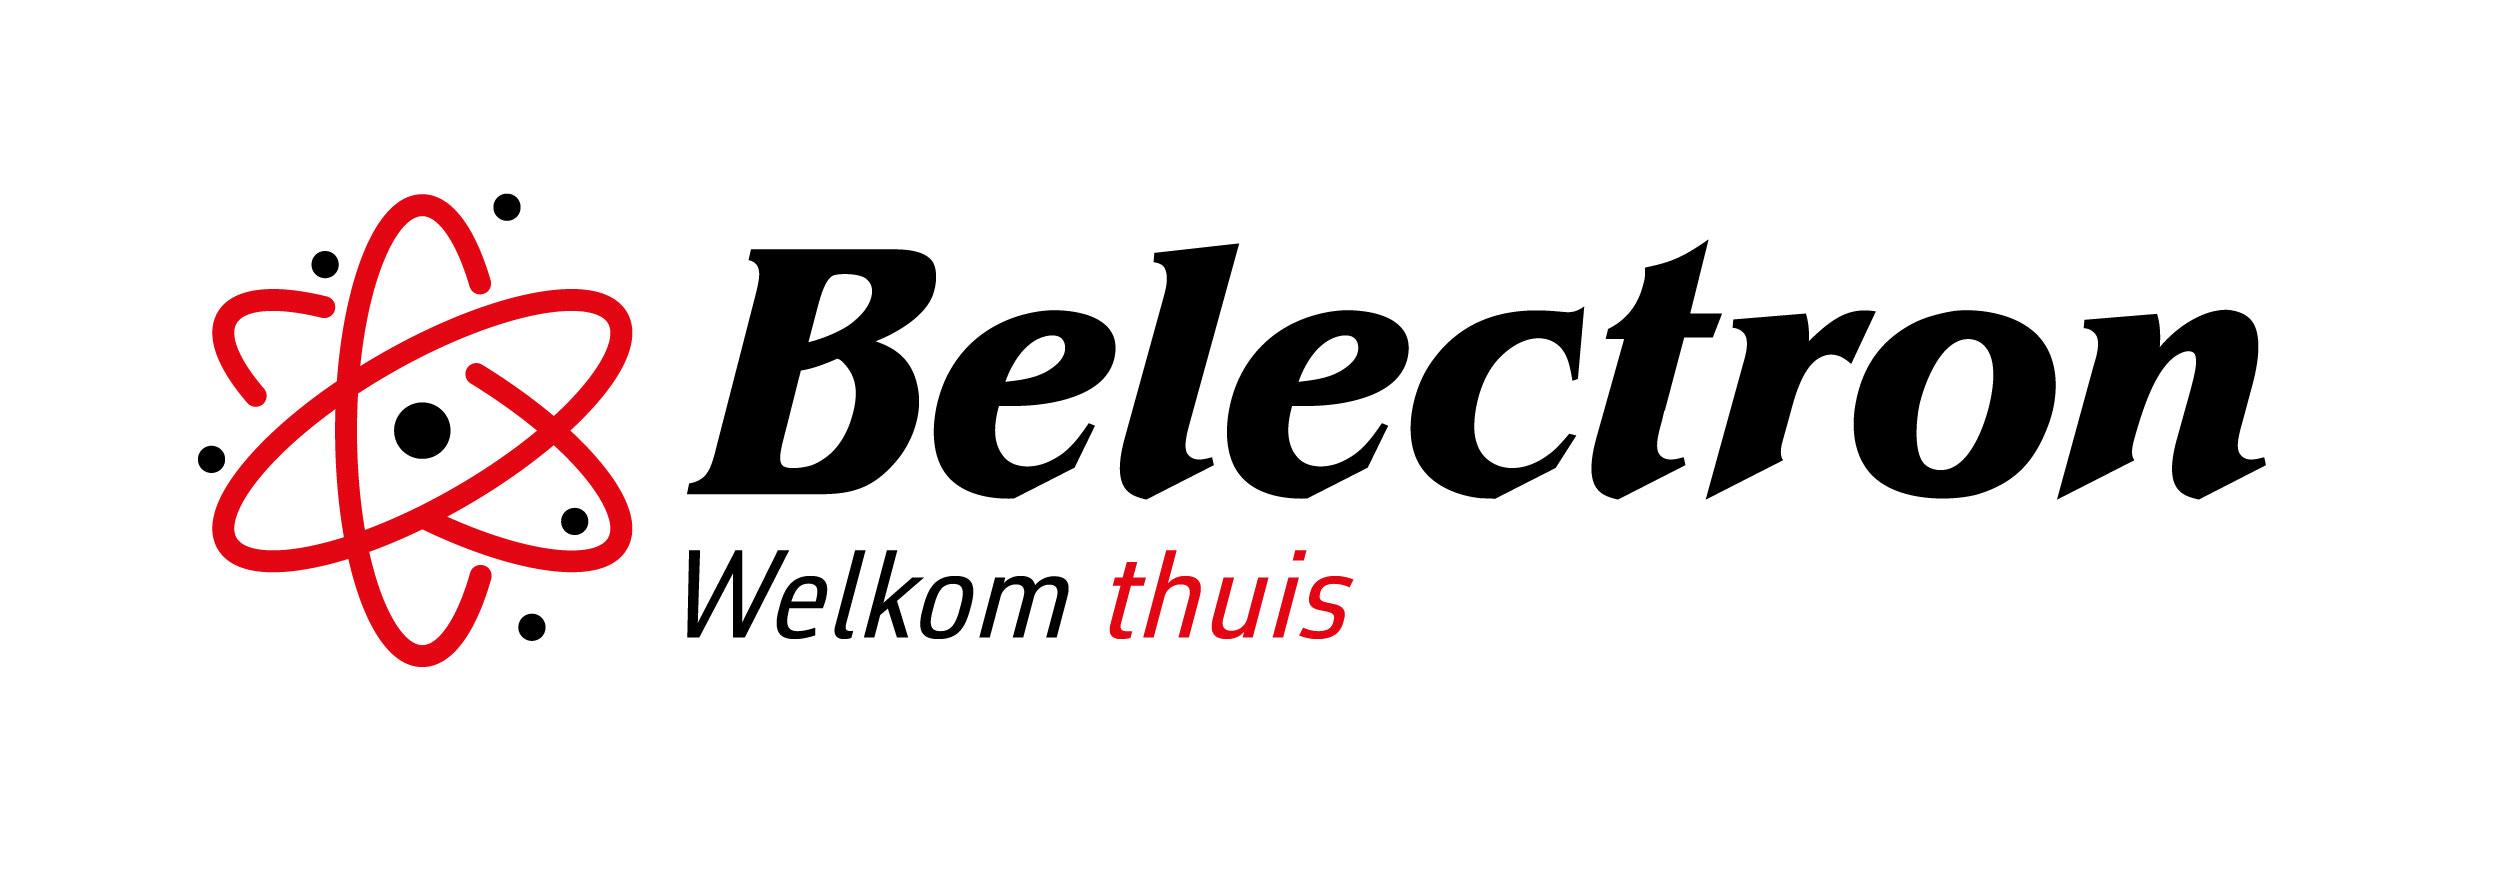 Belectron